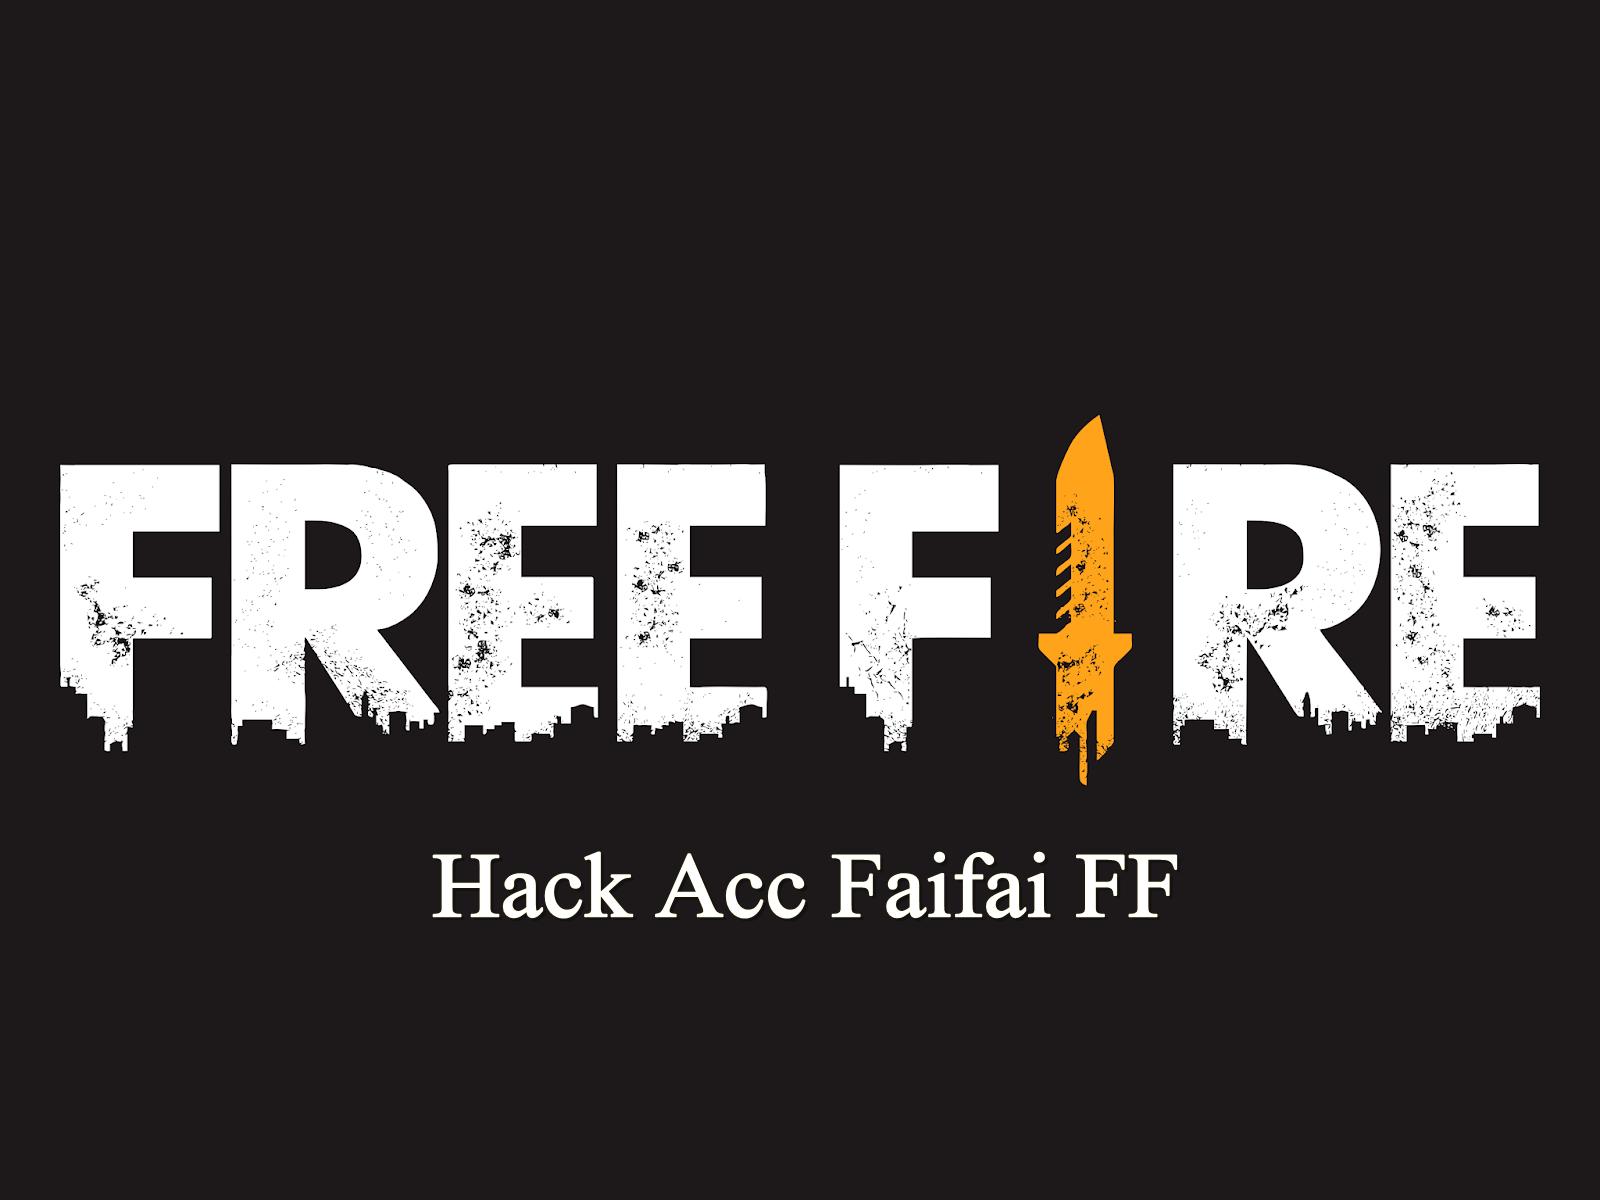 Hack Acc Faifai